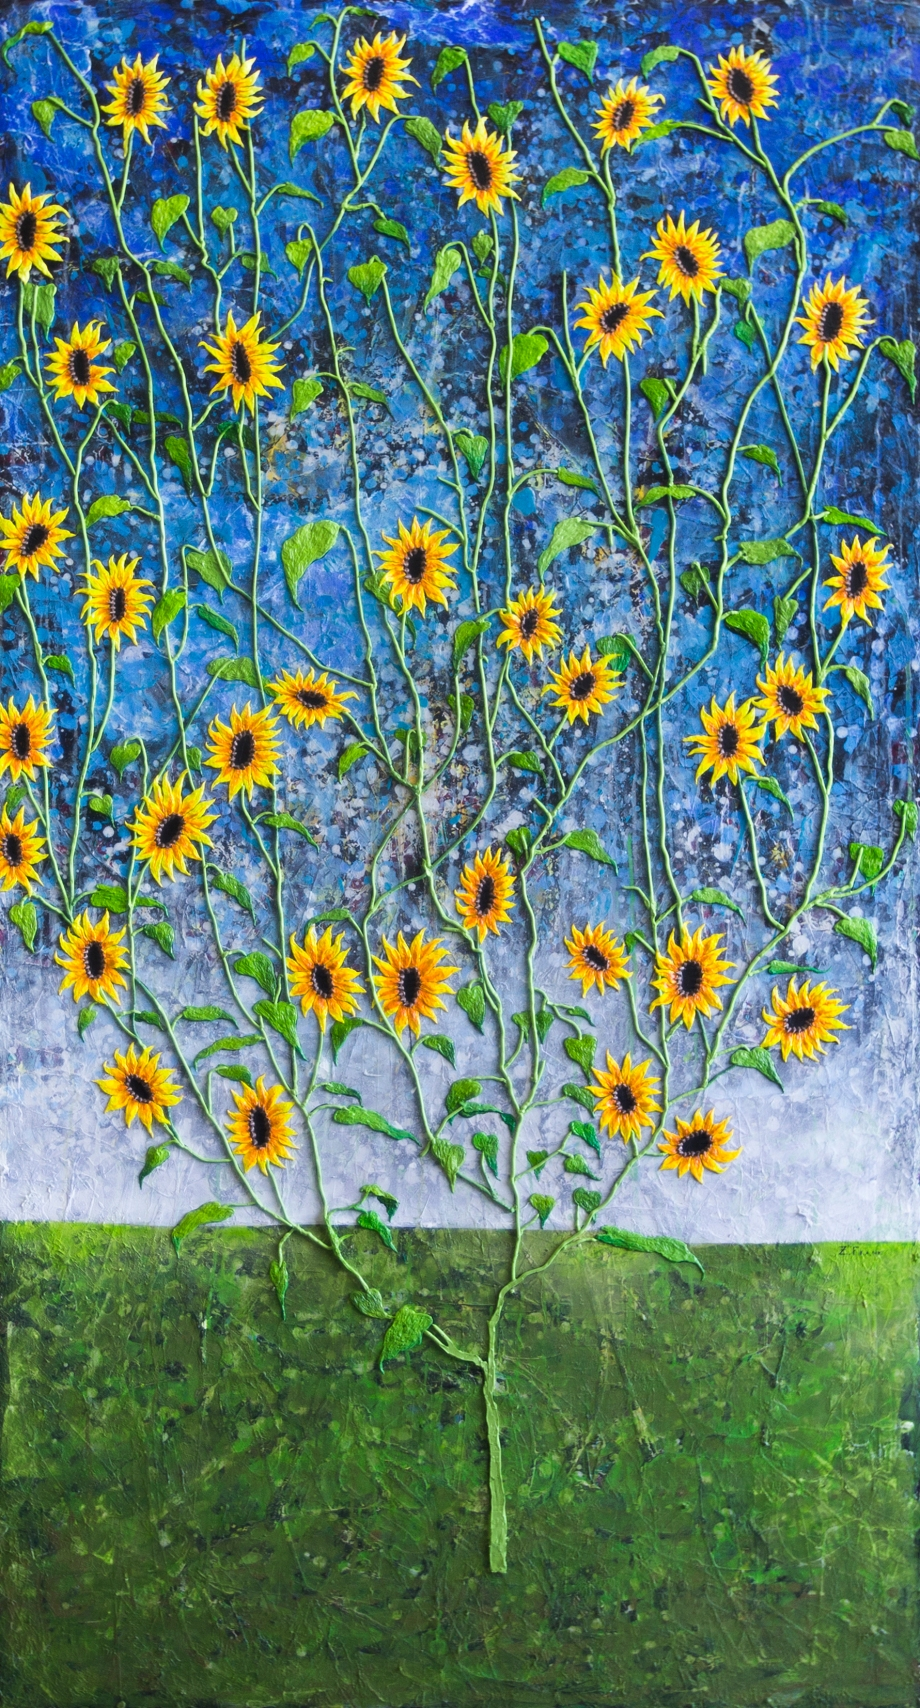 The Magnificent Sunflower Bush